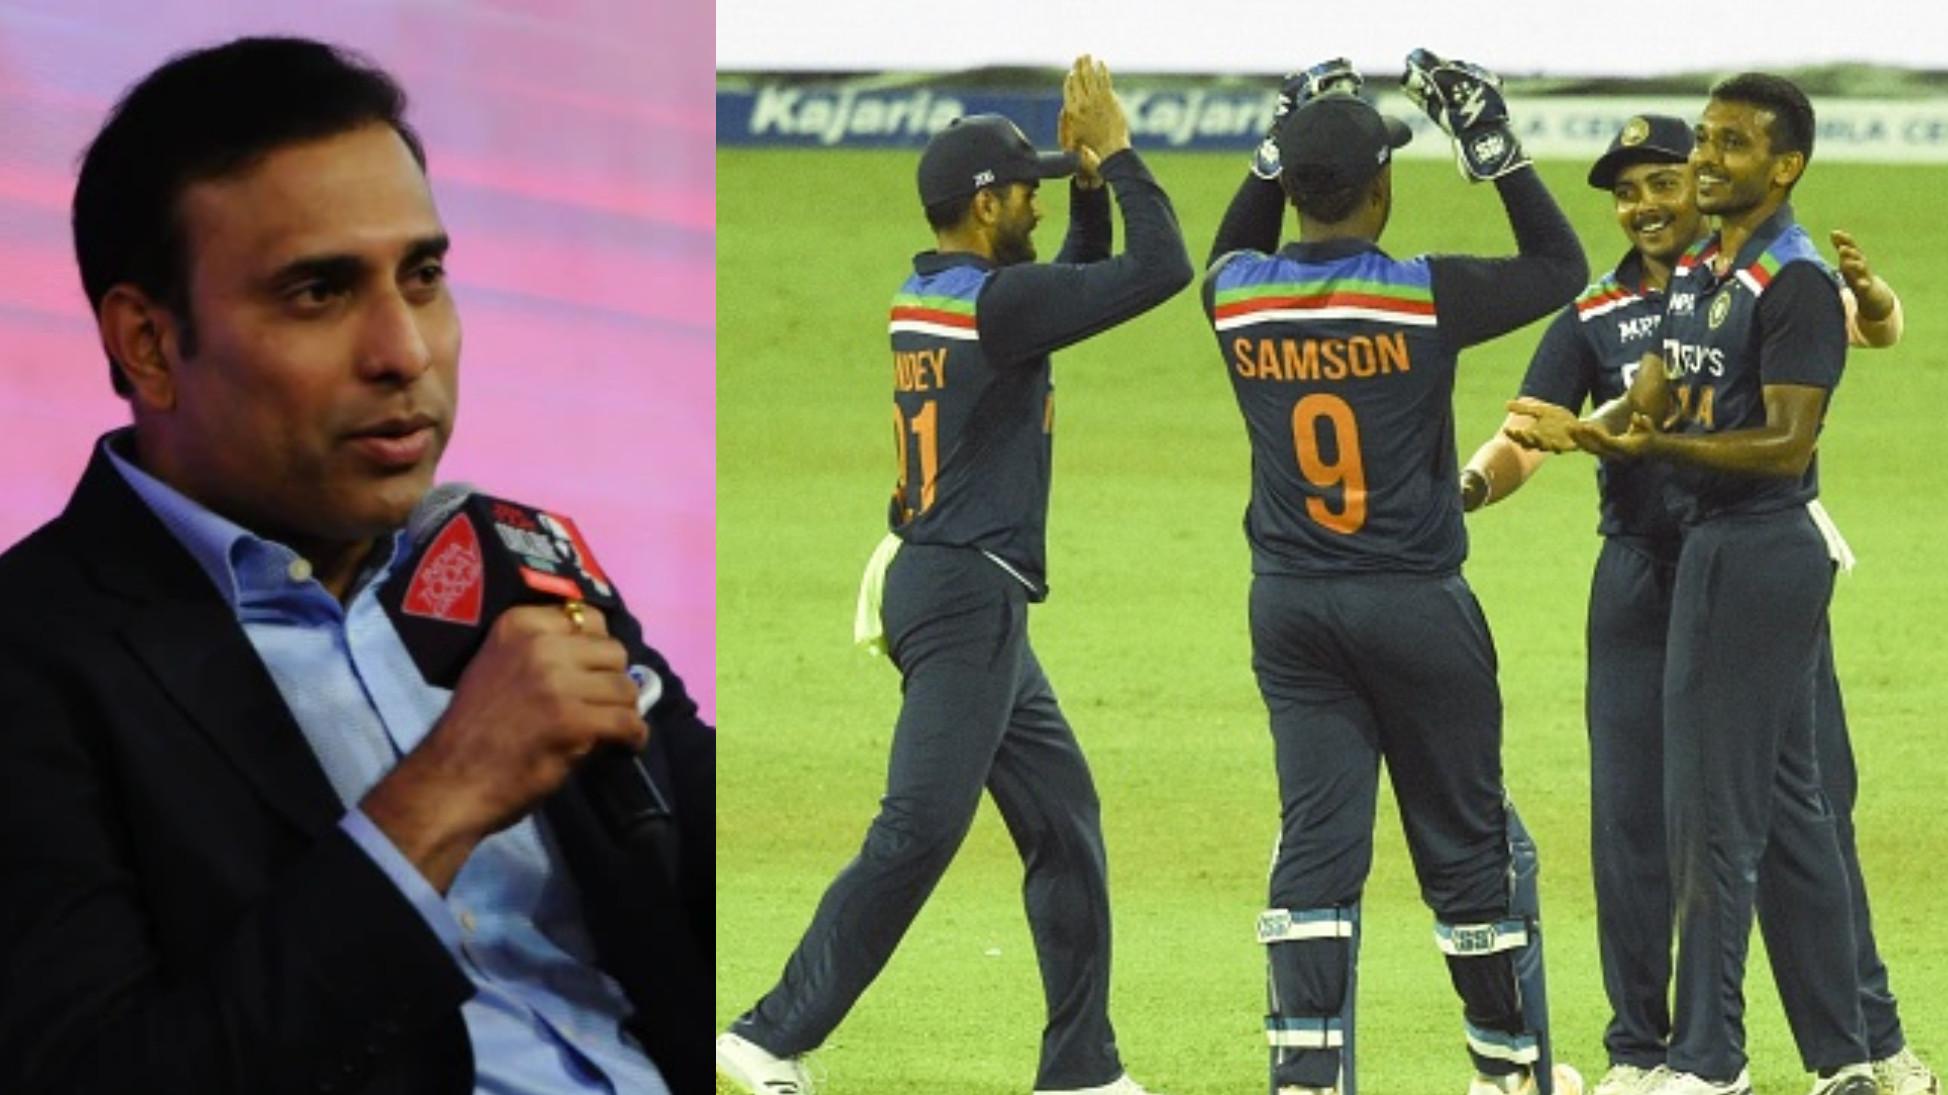 SL v IND 2021: VVS Laxman says Indian bowlers should show more 'constancy'